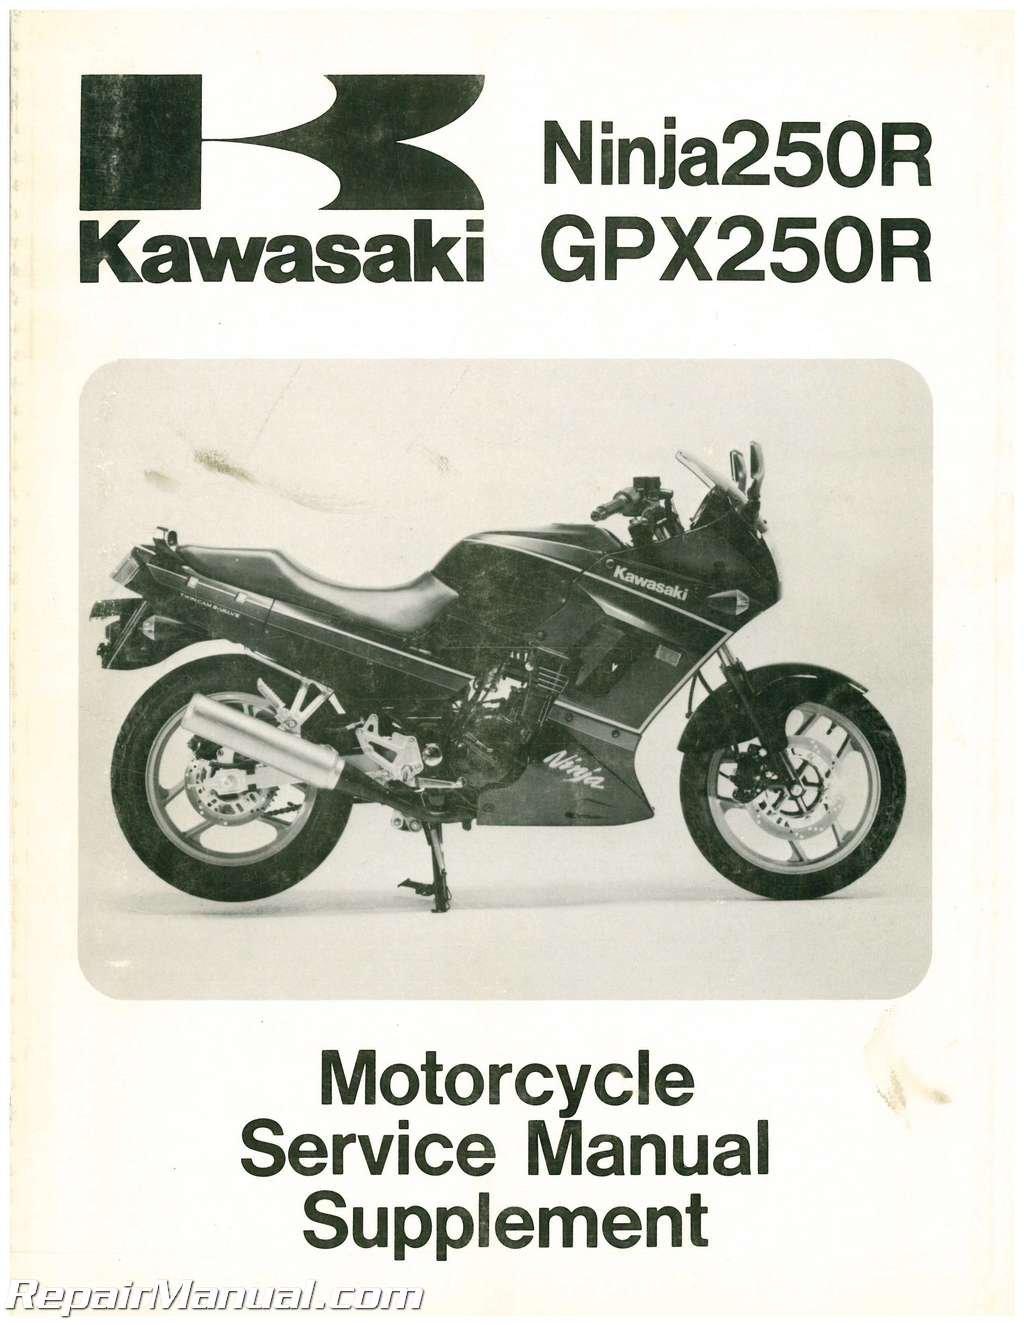 U99924-1109-56 Used 1988-1995 Kawasaki EX250F Ninja Motorcycle Supplement  Manual: Manufacturer: Amazon.com: Books